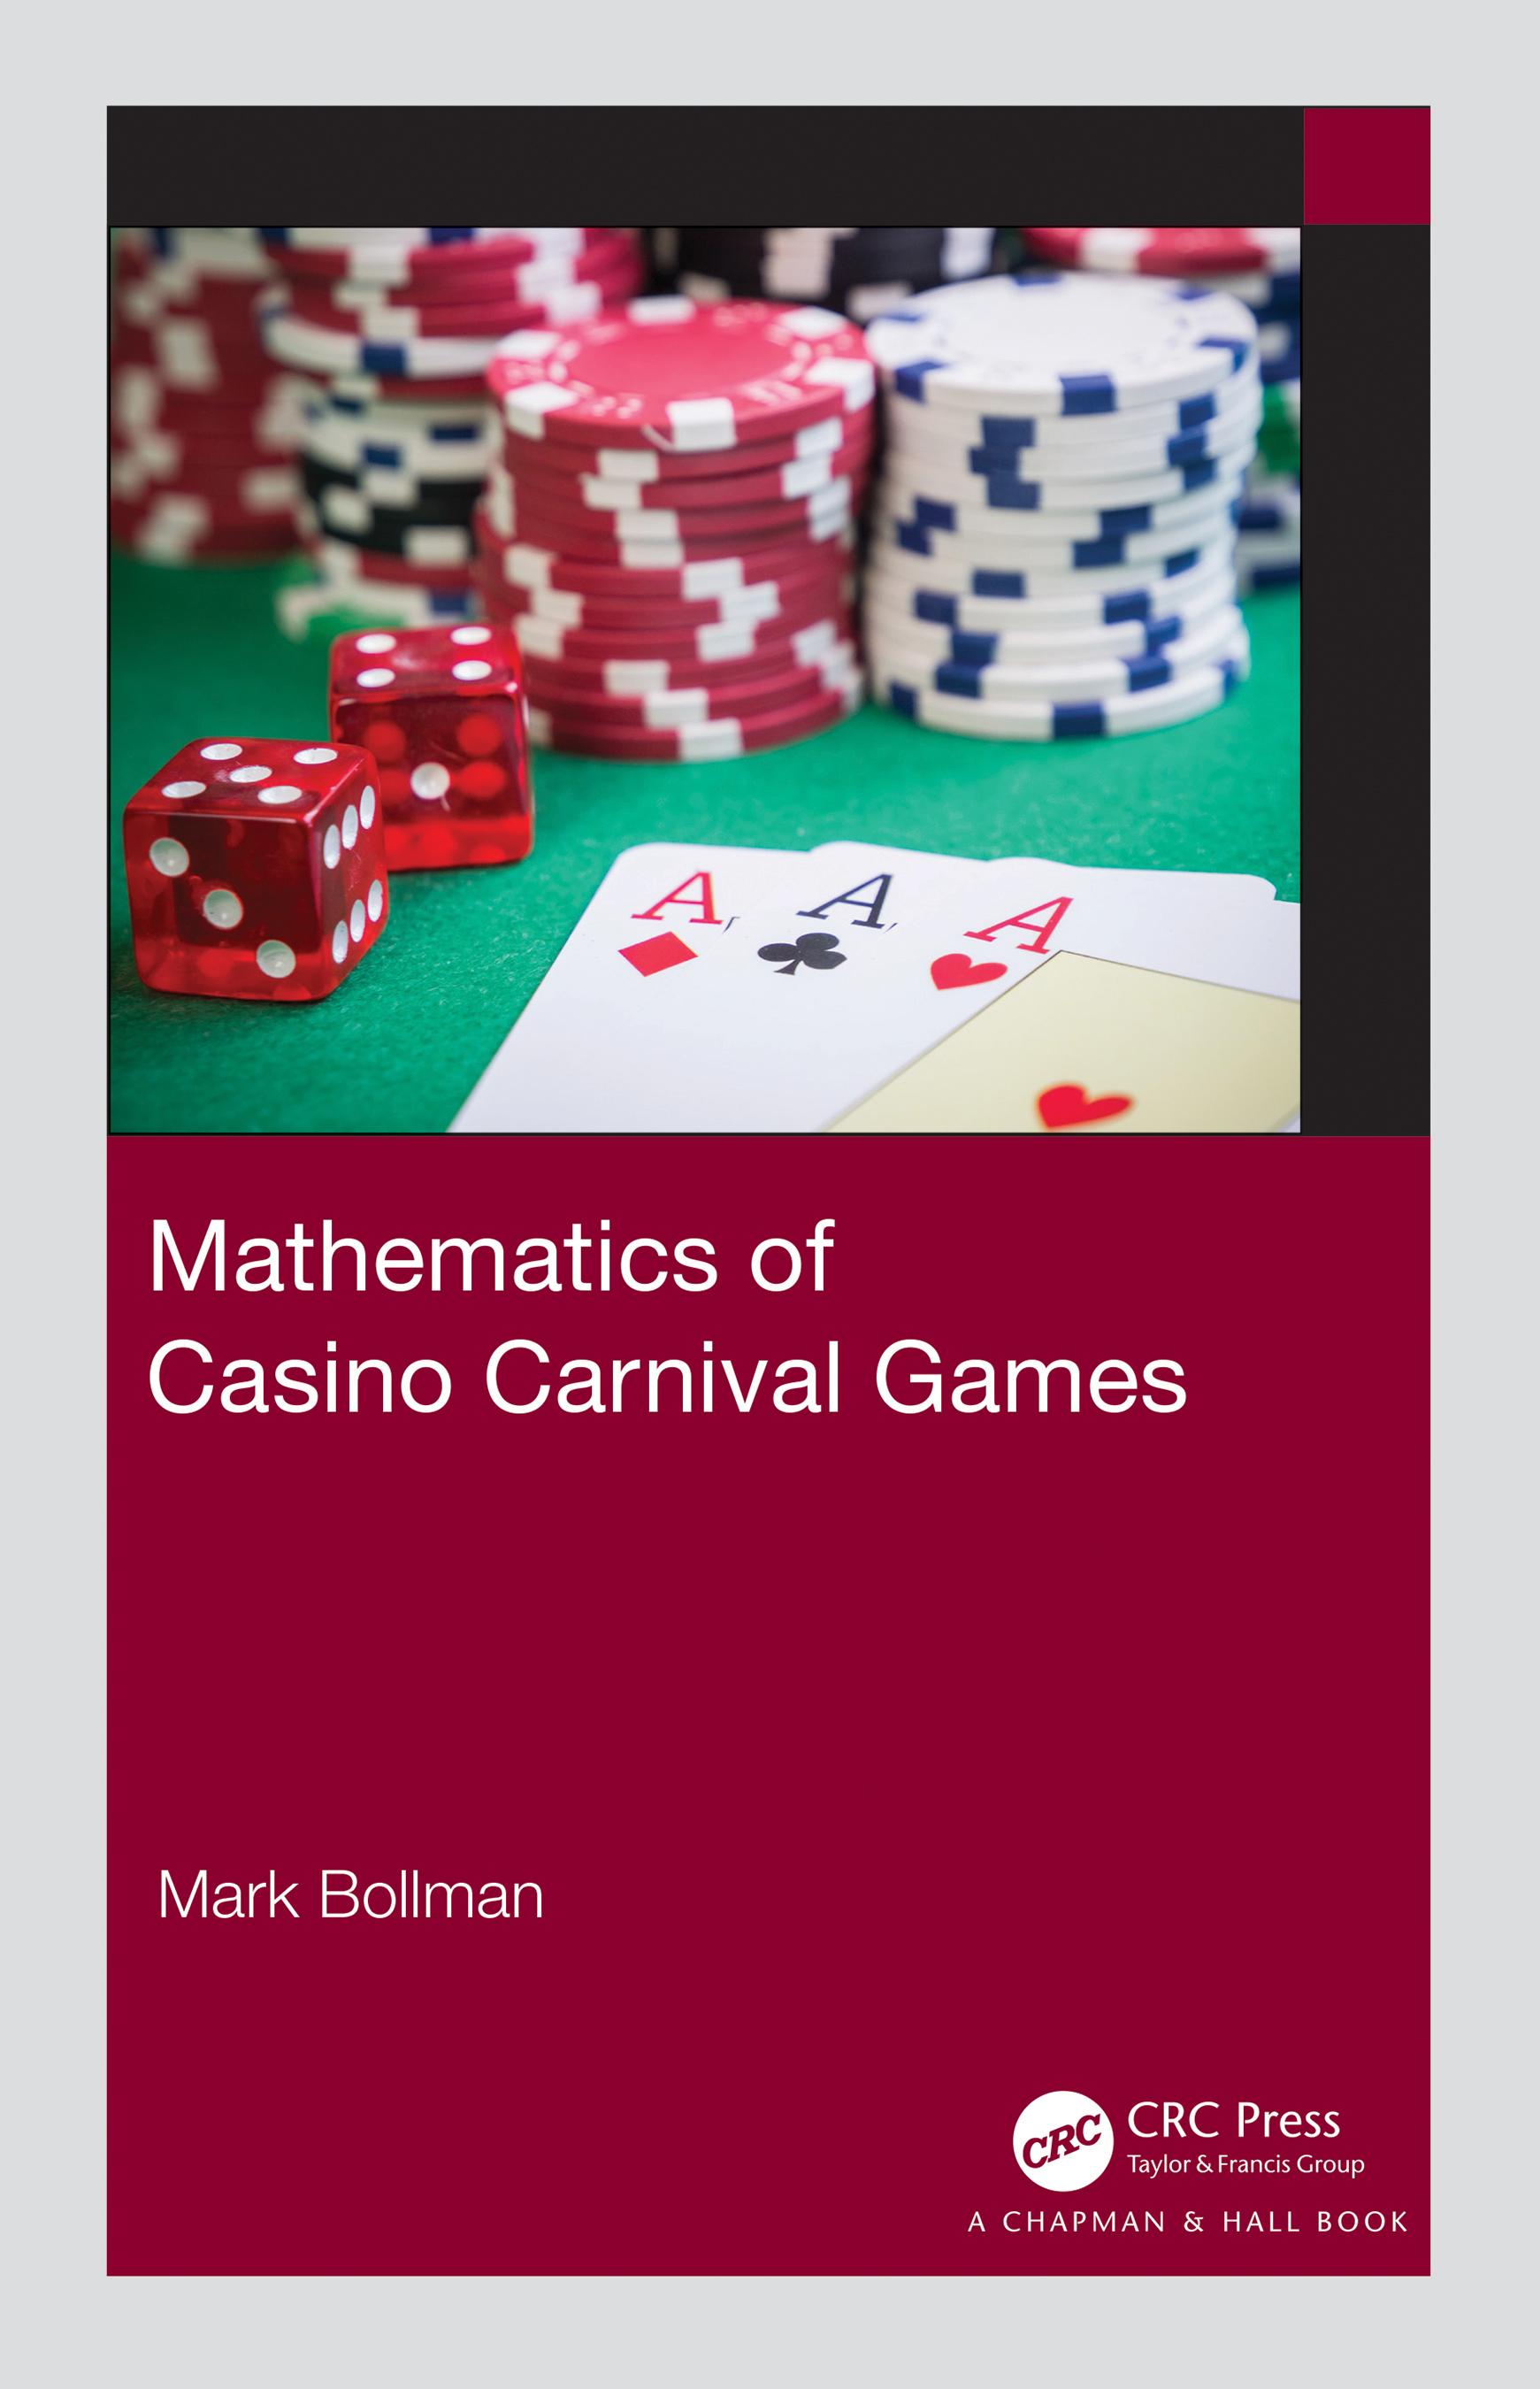 Mathematics of Casino Carnival Games